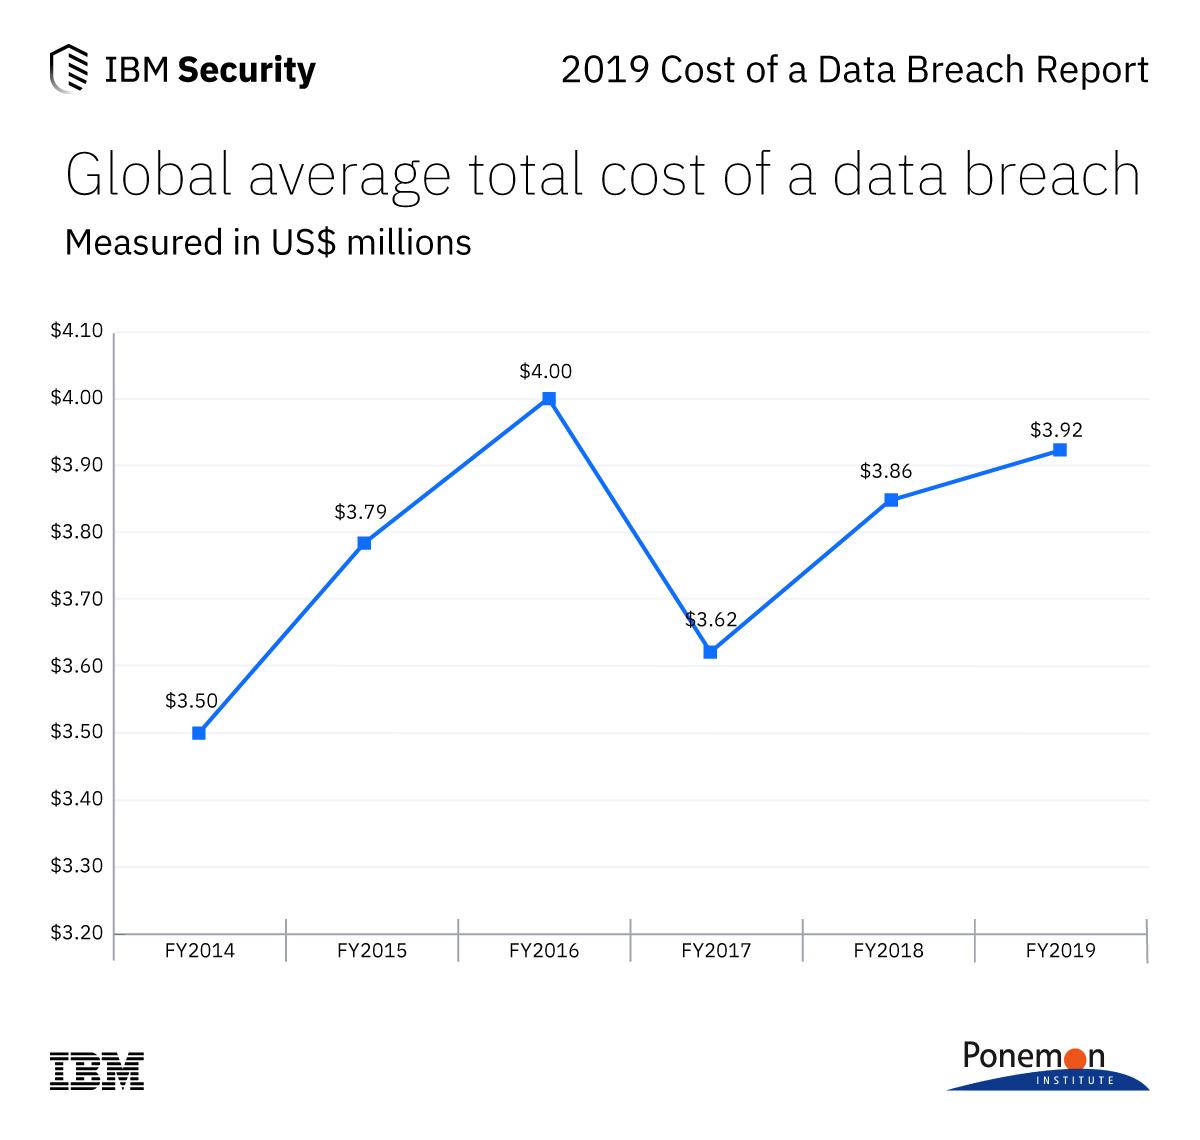 2019 Cost of a Data Breach Report